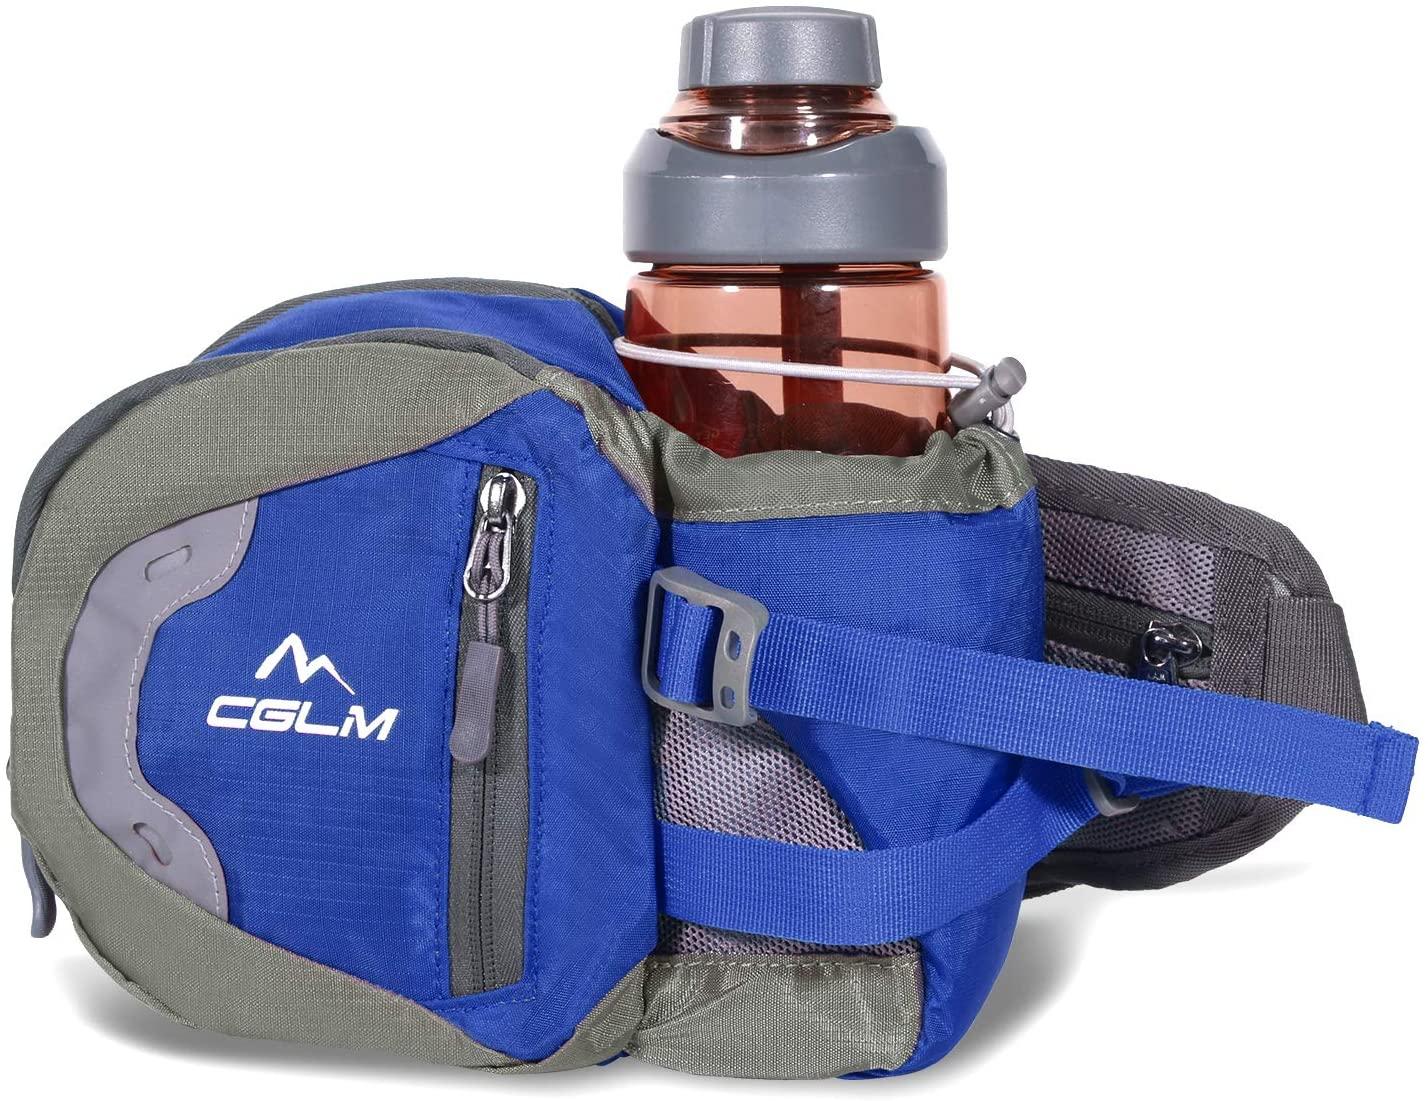 Fanny Pack Waist Bag for Men Women Water Bottle Holder Adjustable Belt for Hiking Travel Outdoor Walking Running Carry iPhone Money Blue